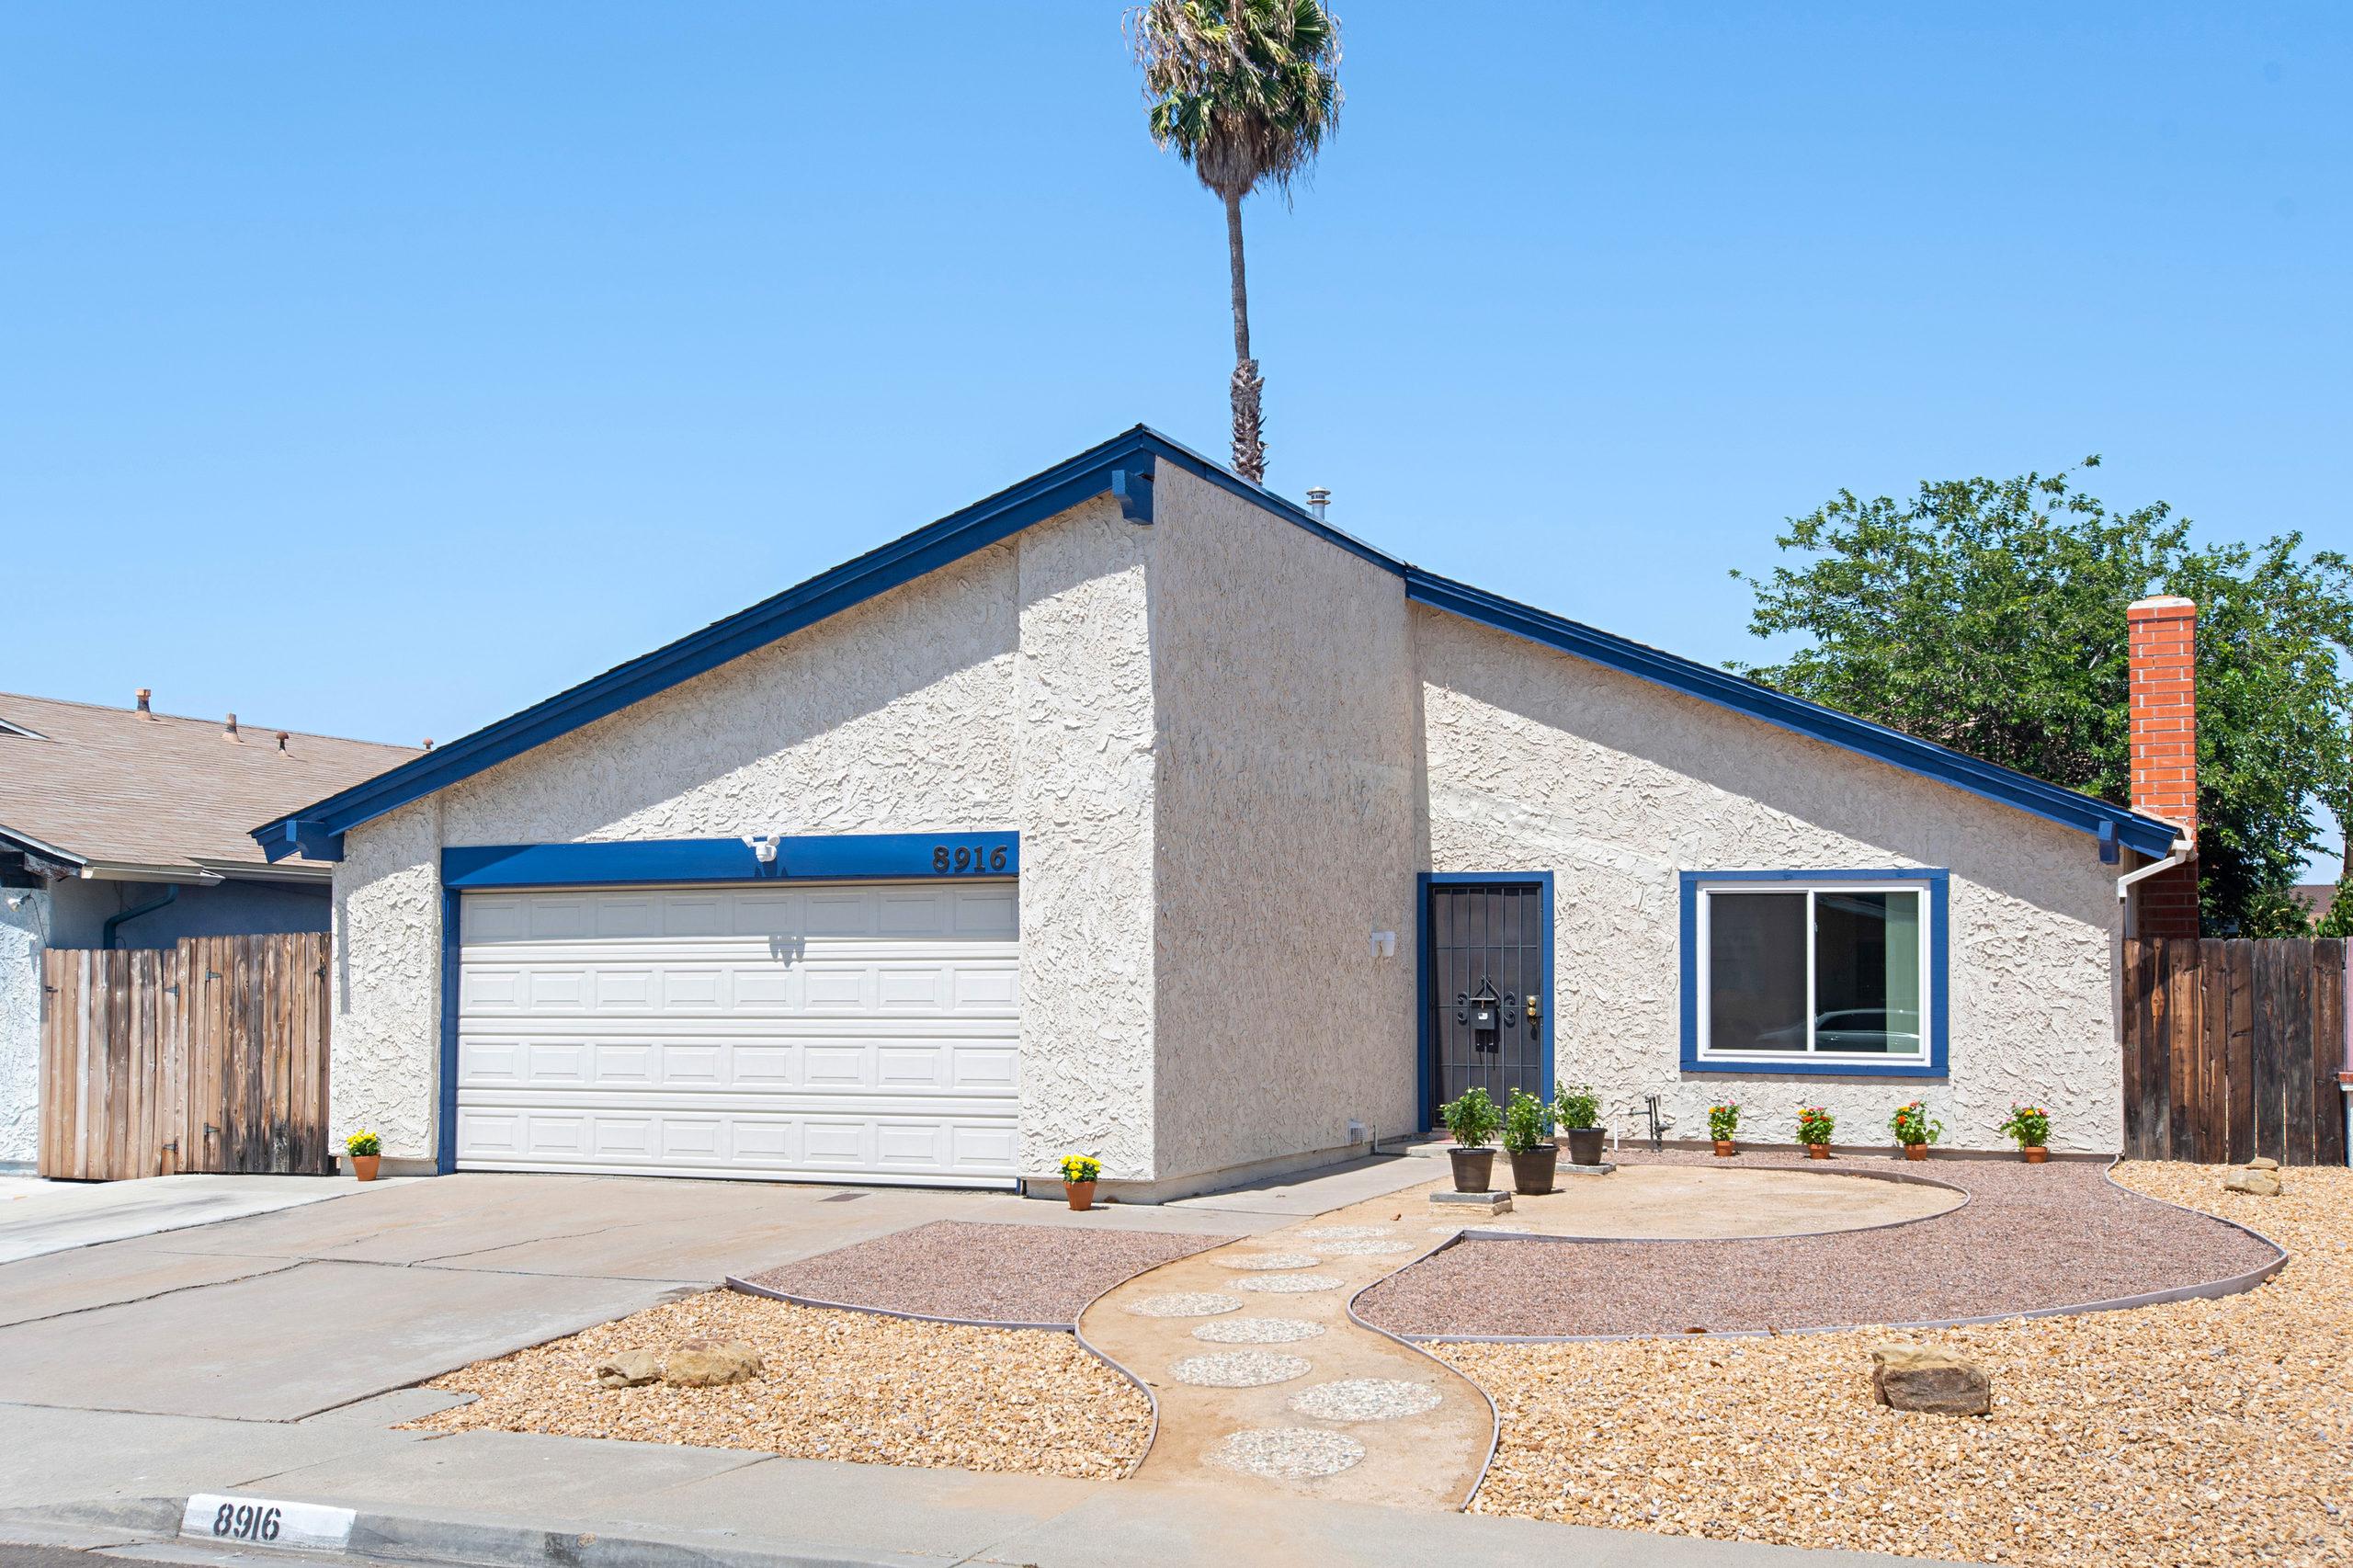 8916 Canis Lane, San Diego, CA 92126